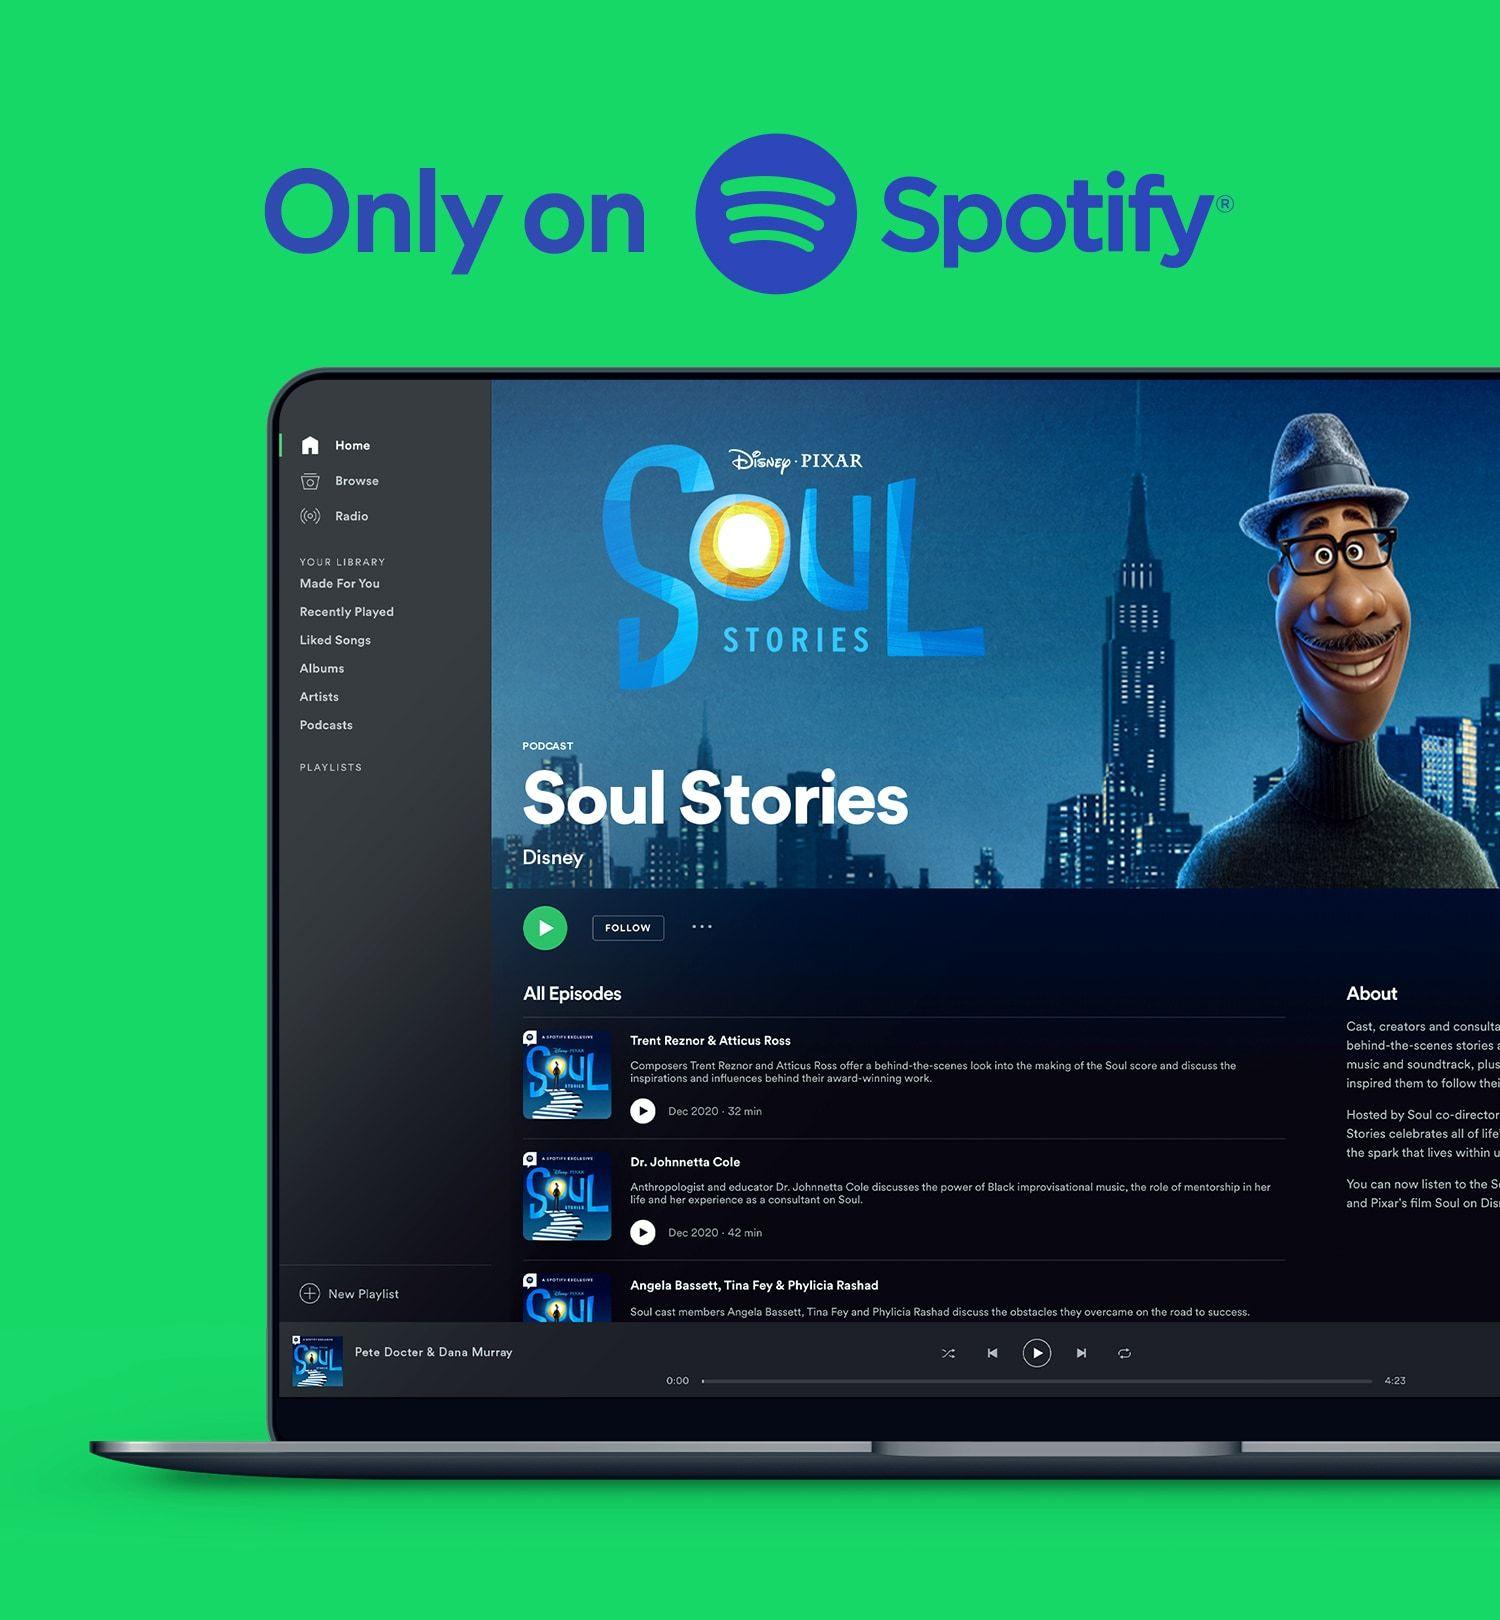 Gershoni CS Spotify Soul Only On Spotify 1920x1080 030921